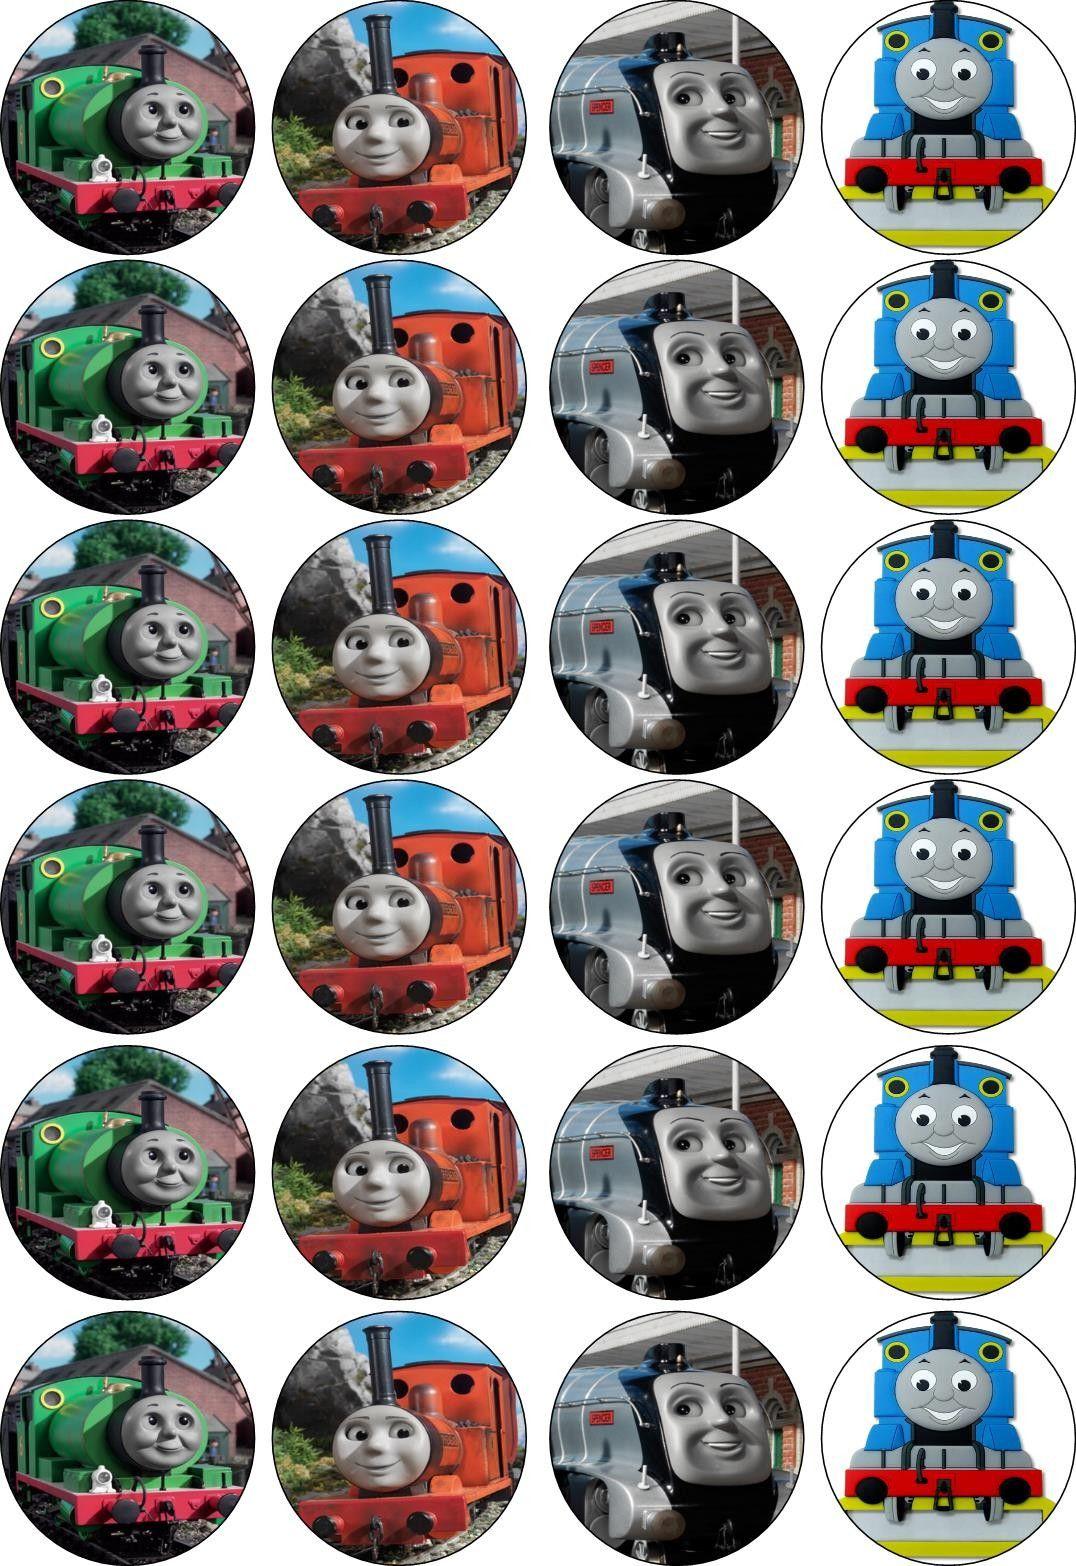 Pincrafty Annabelle On Thomas The Train Printables | Thomas The - Free Printable Train Cupcake Toppers